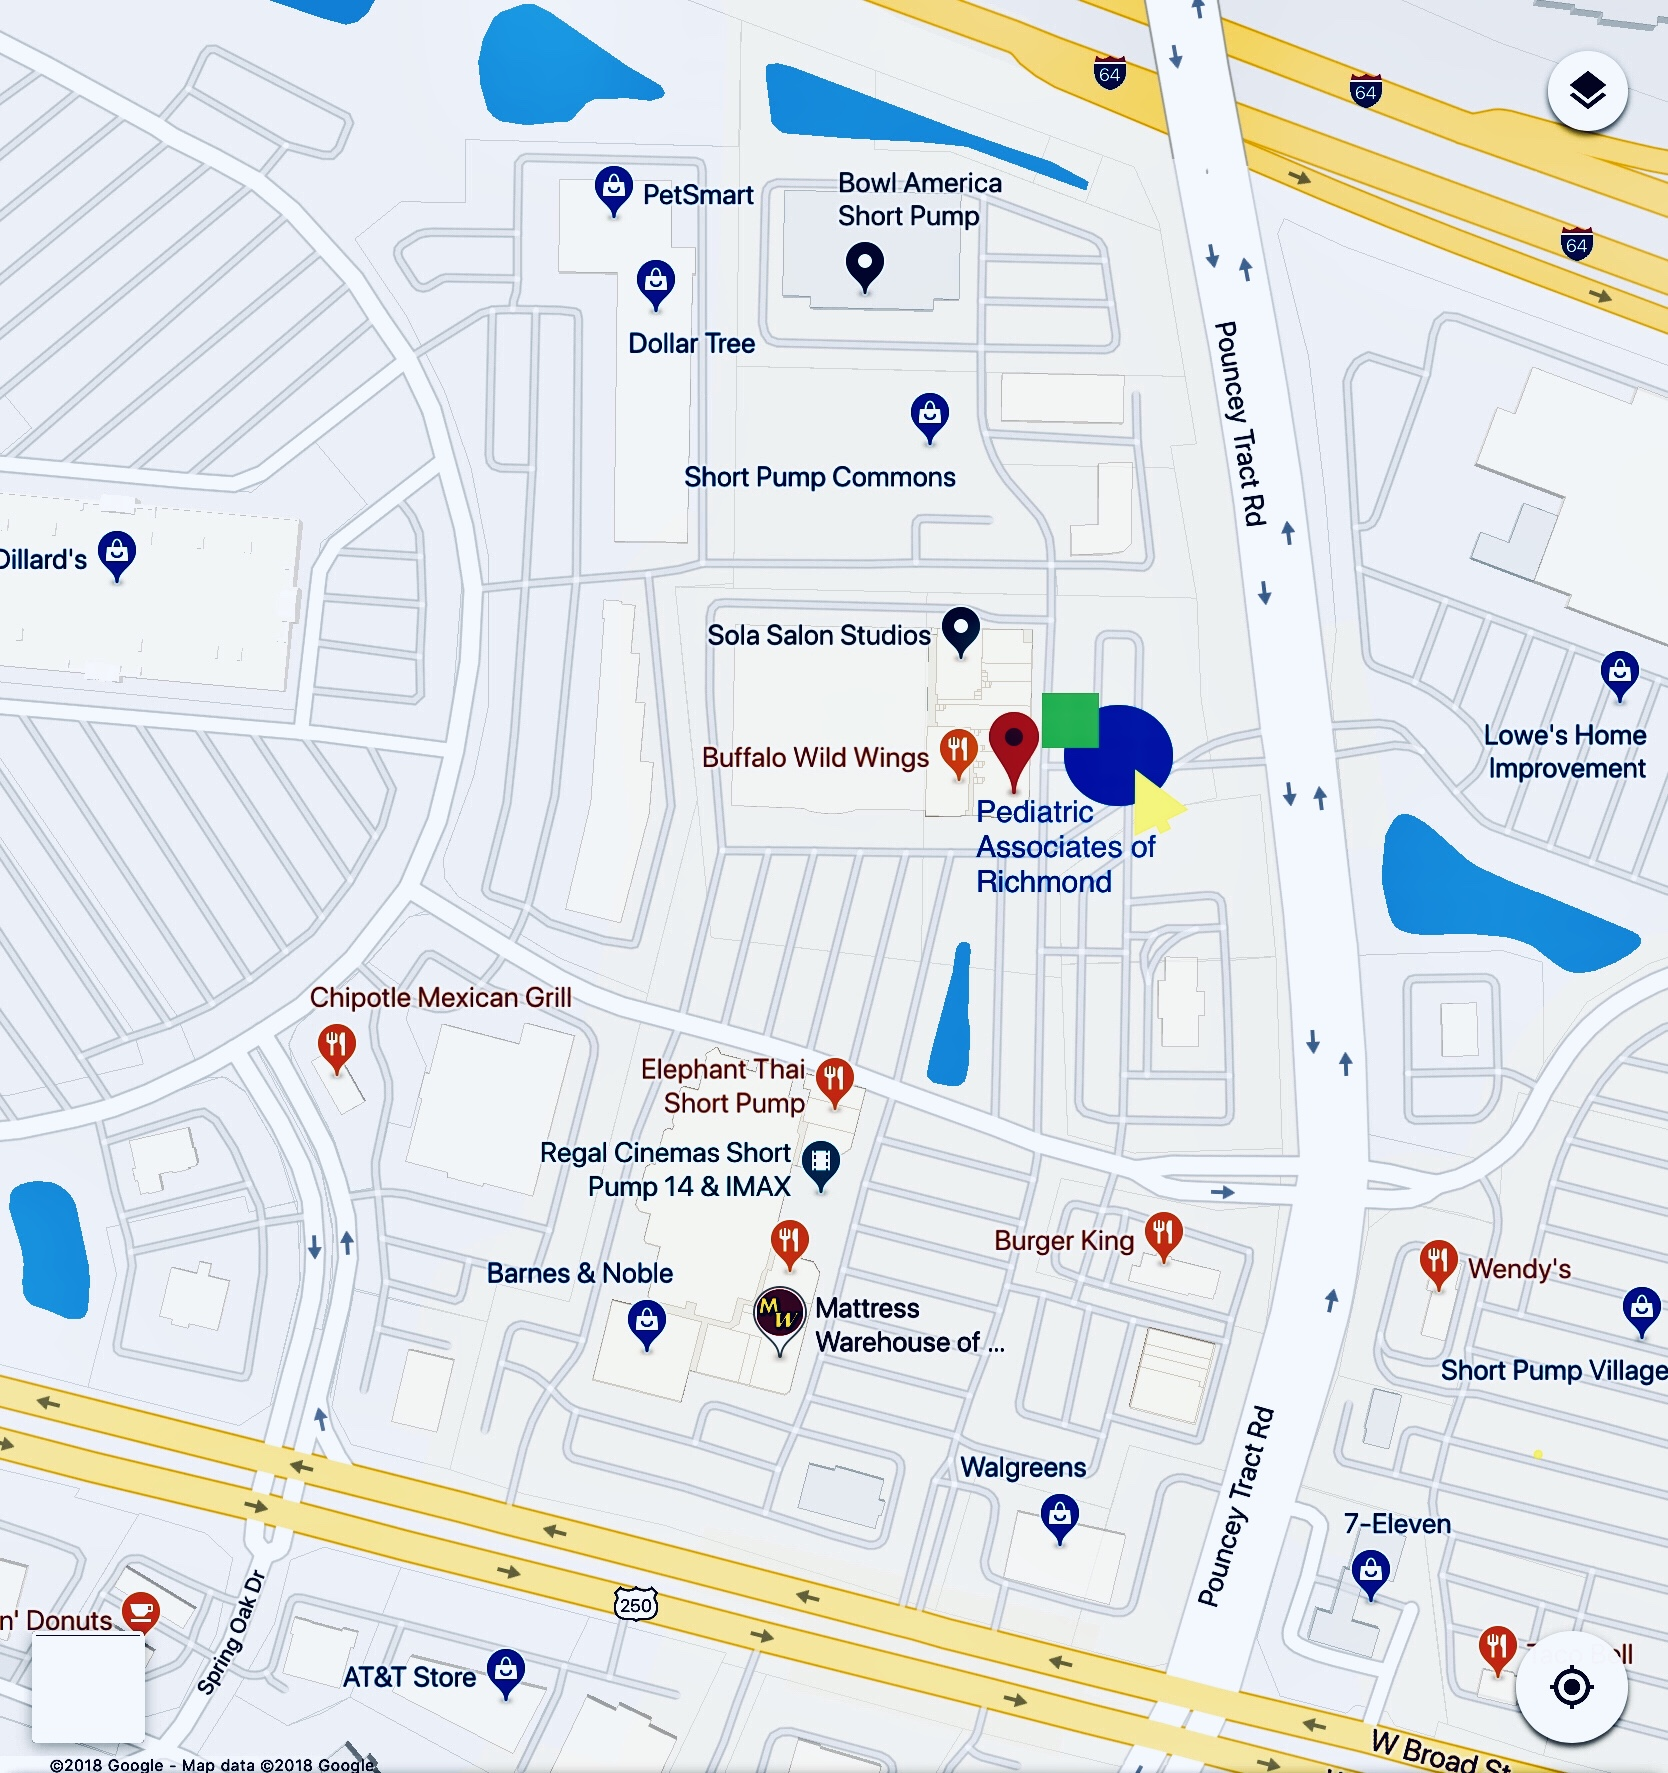 SP Google map - Pediatric ociates of Richmond on